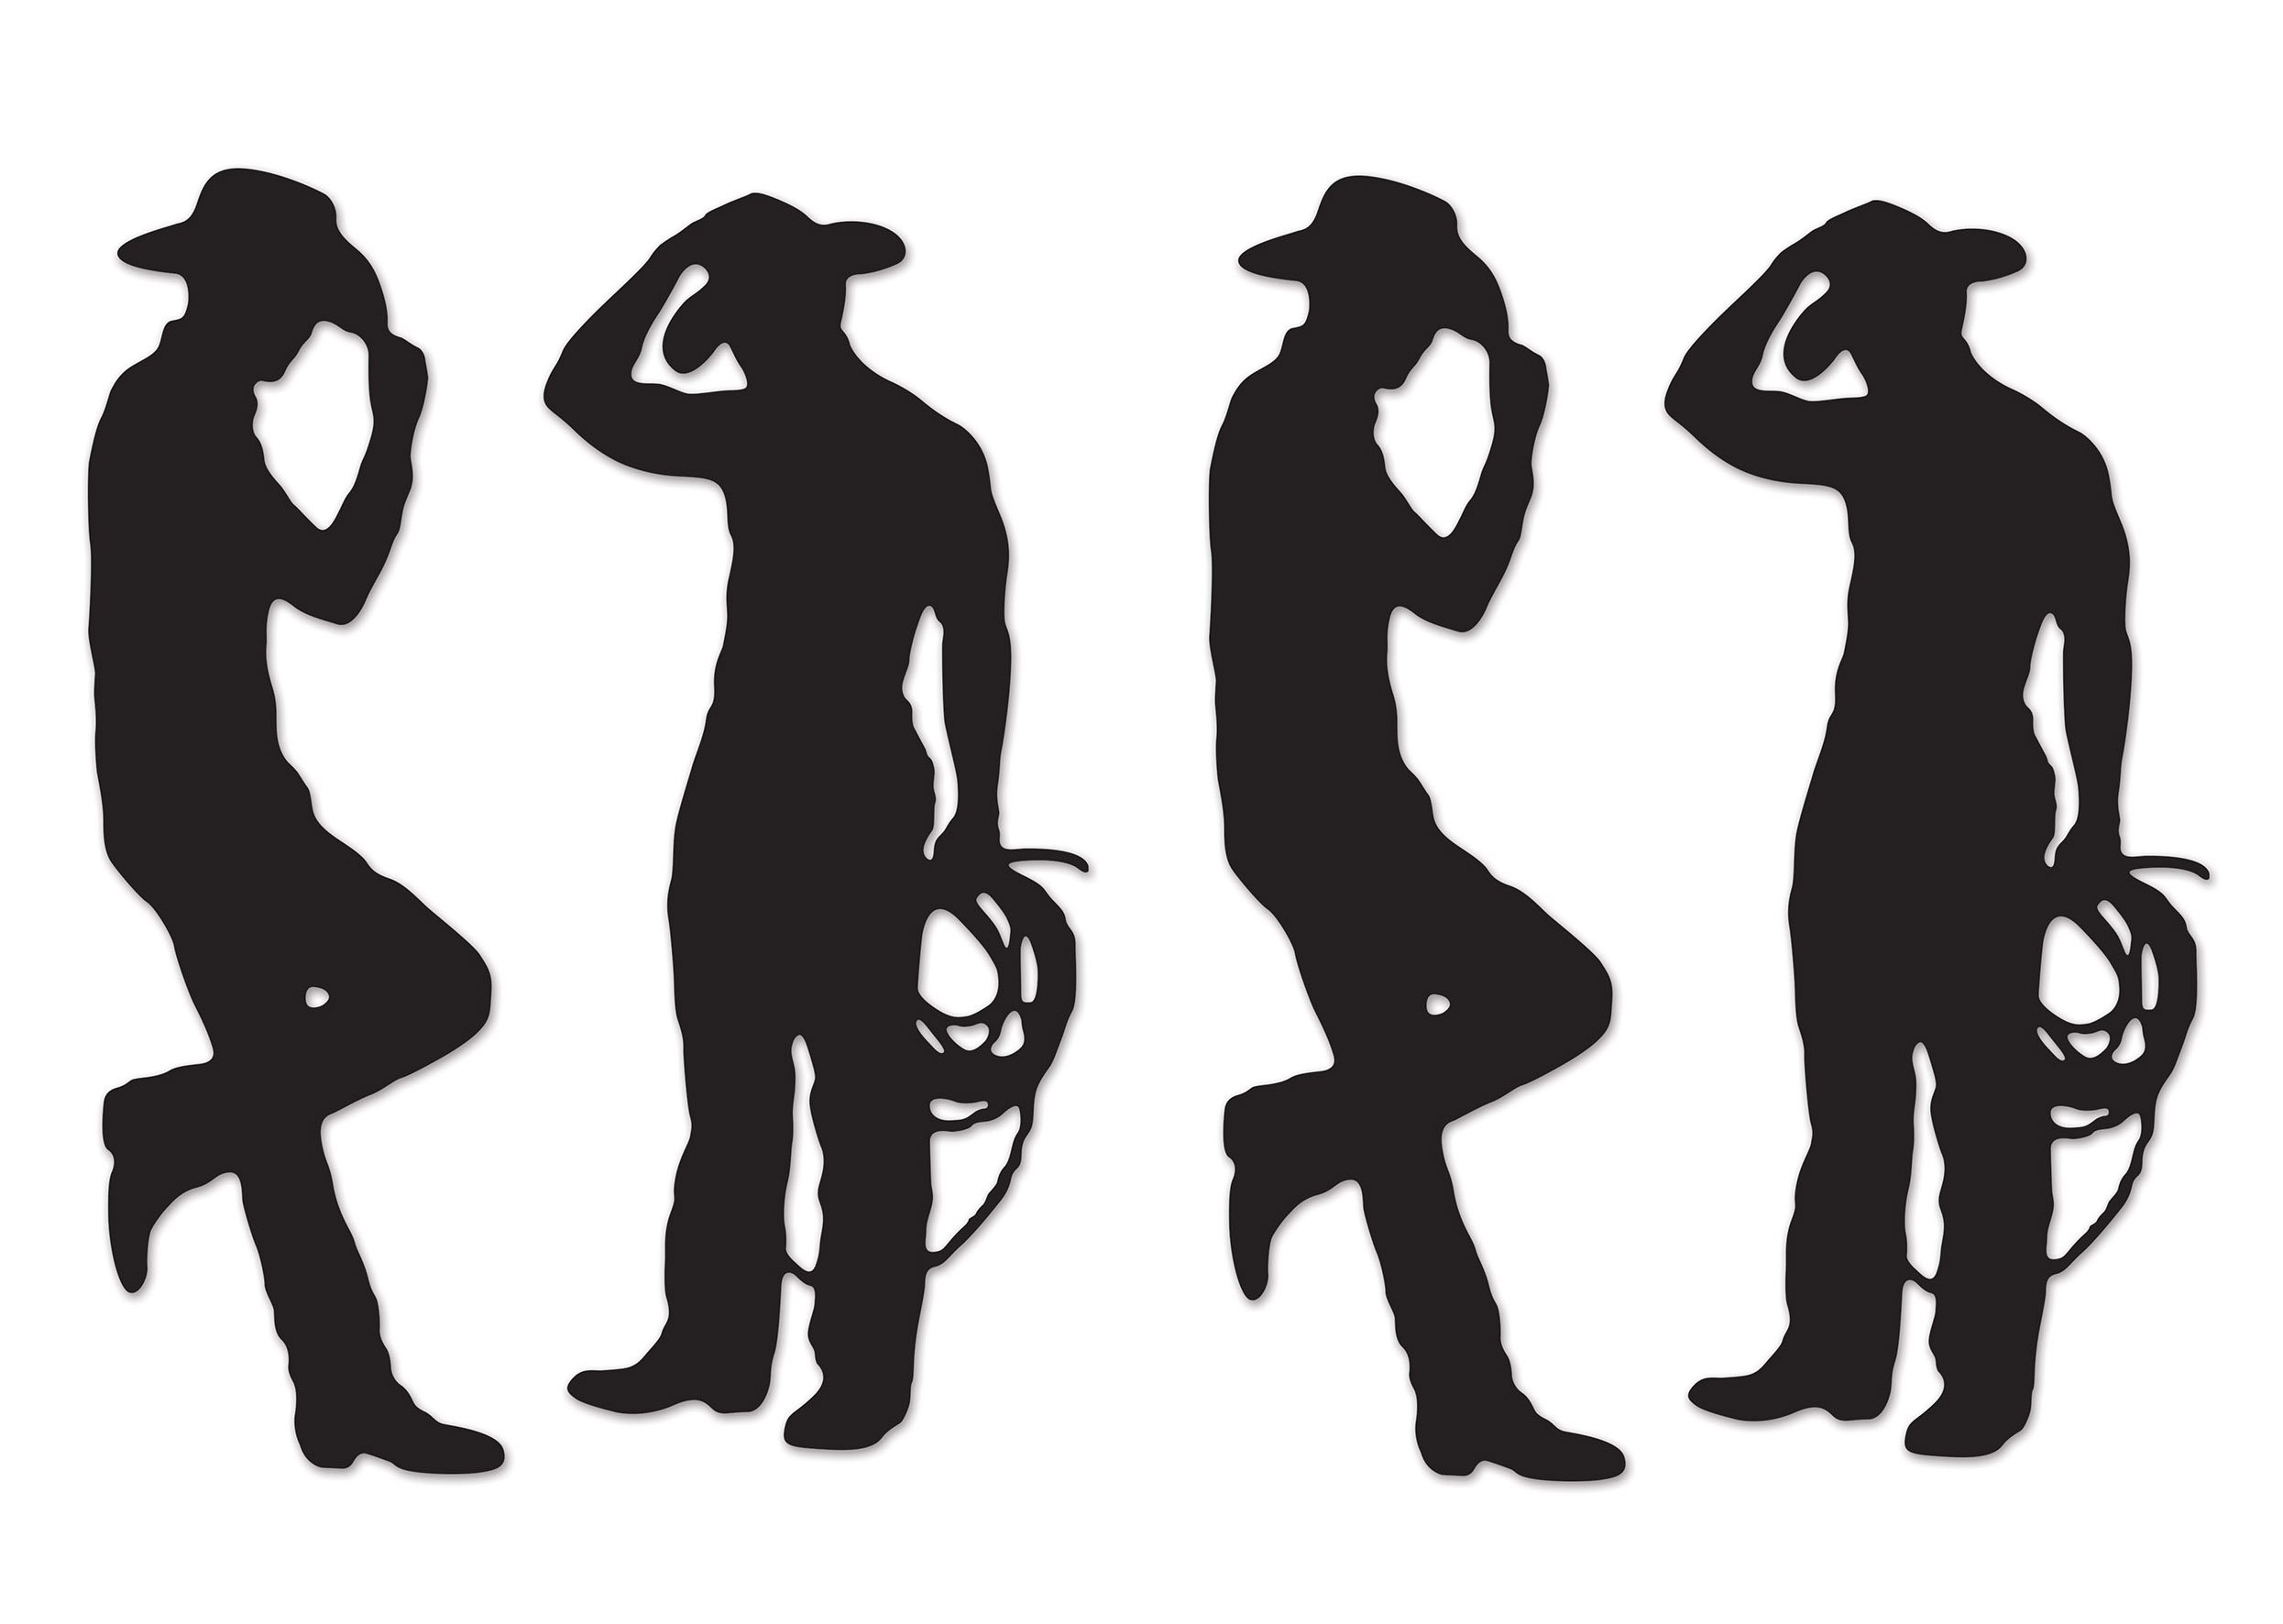 Beistle S54225AZ2, 4 Piece Cowboy Silhouettes, 35'' & 37'' (Black) by Beistle